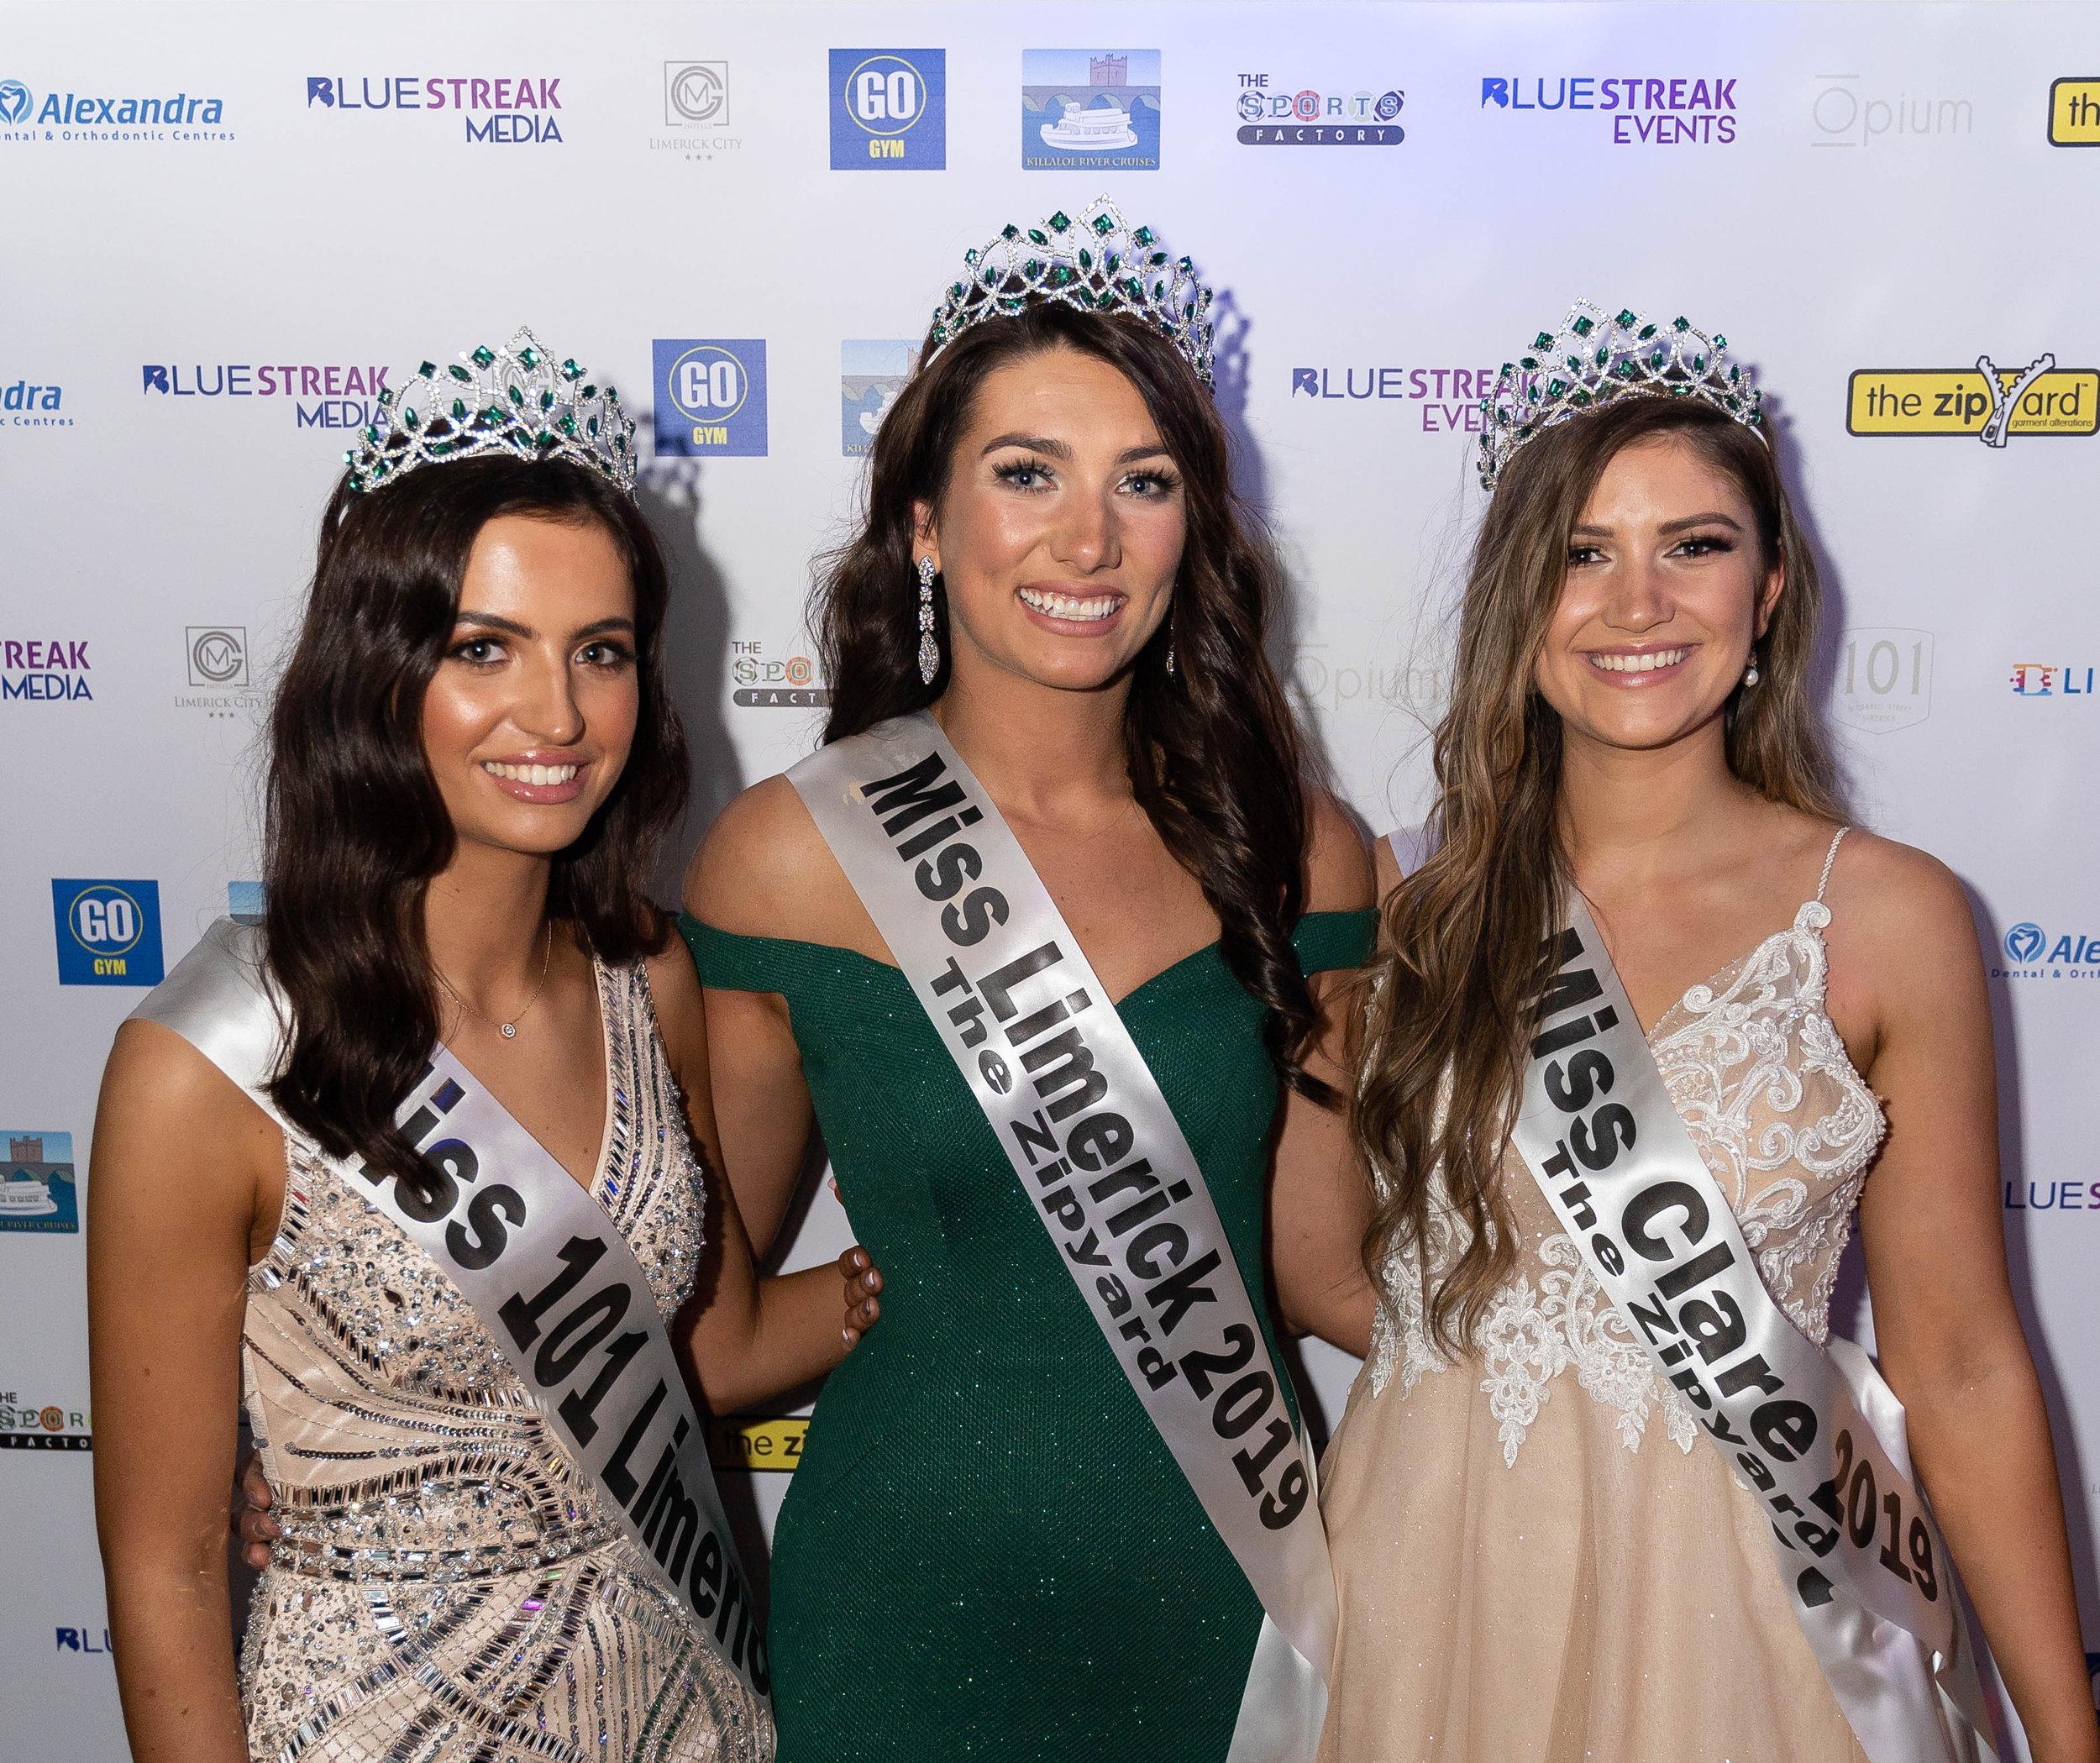 Miss 101 Limerick Christina Alcazar Deverell, Miss Limerick 2019 Ciara O'Halloran, Miss Clare 2019 Emma Austin.